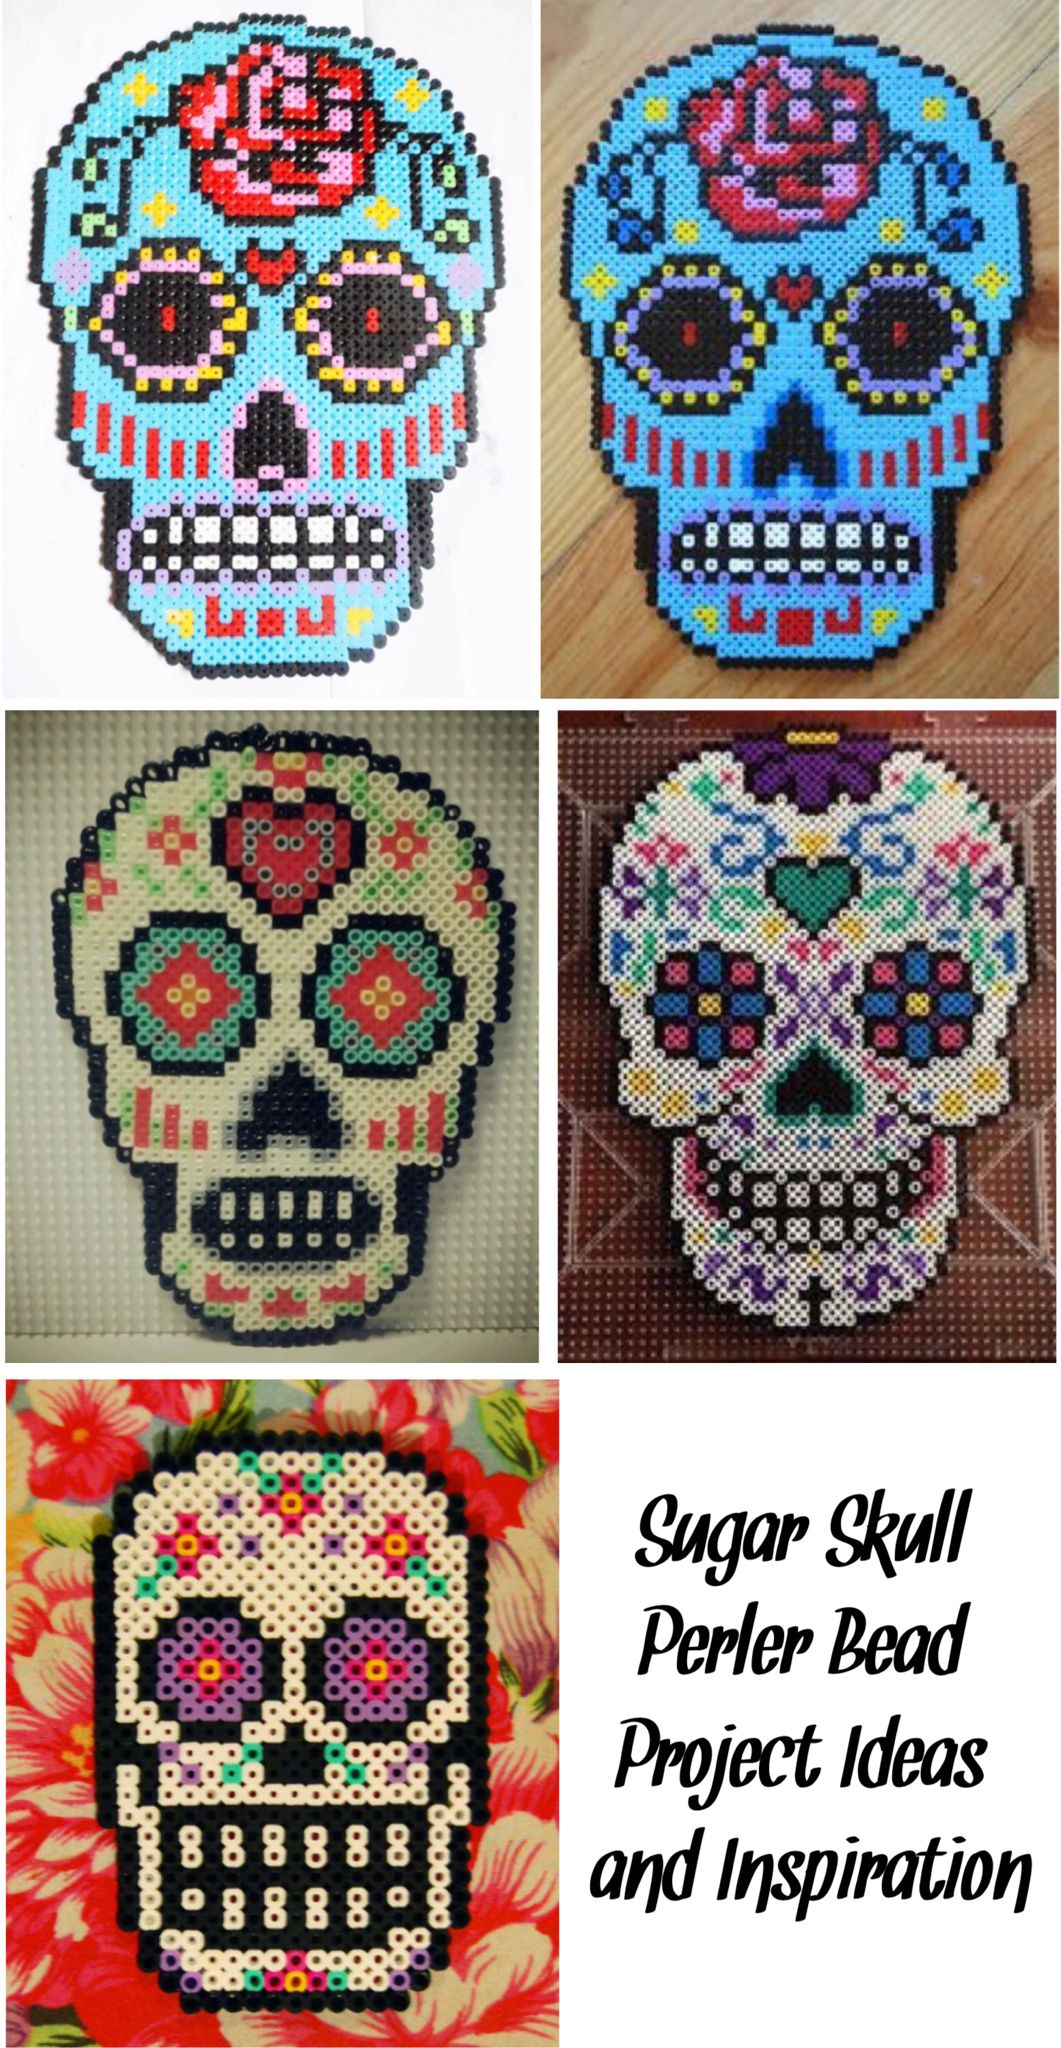 39 sugar skull perler bead project ideas and inspiration 39 b gelperlen b gelperlen hama. Black Bedroom Furniture Sets. Home Design Ideas